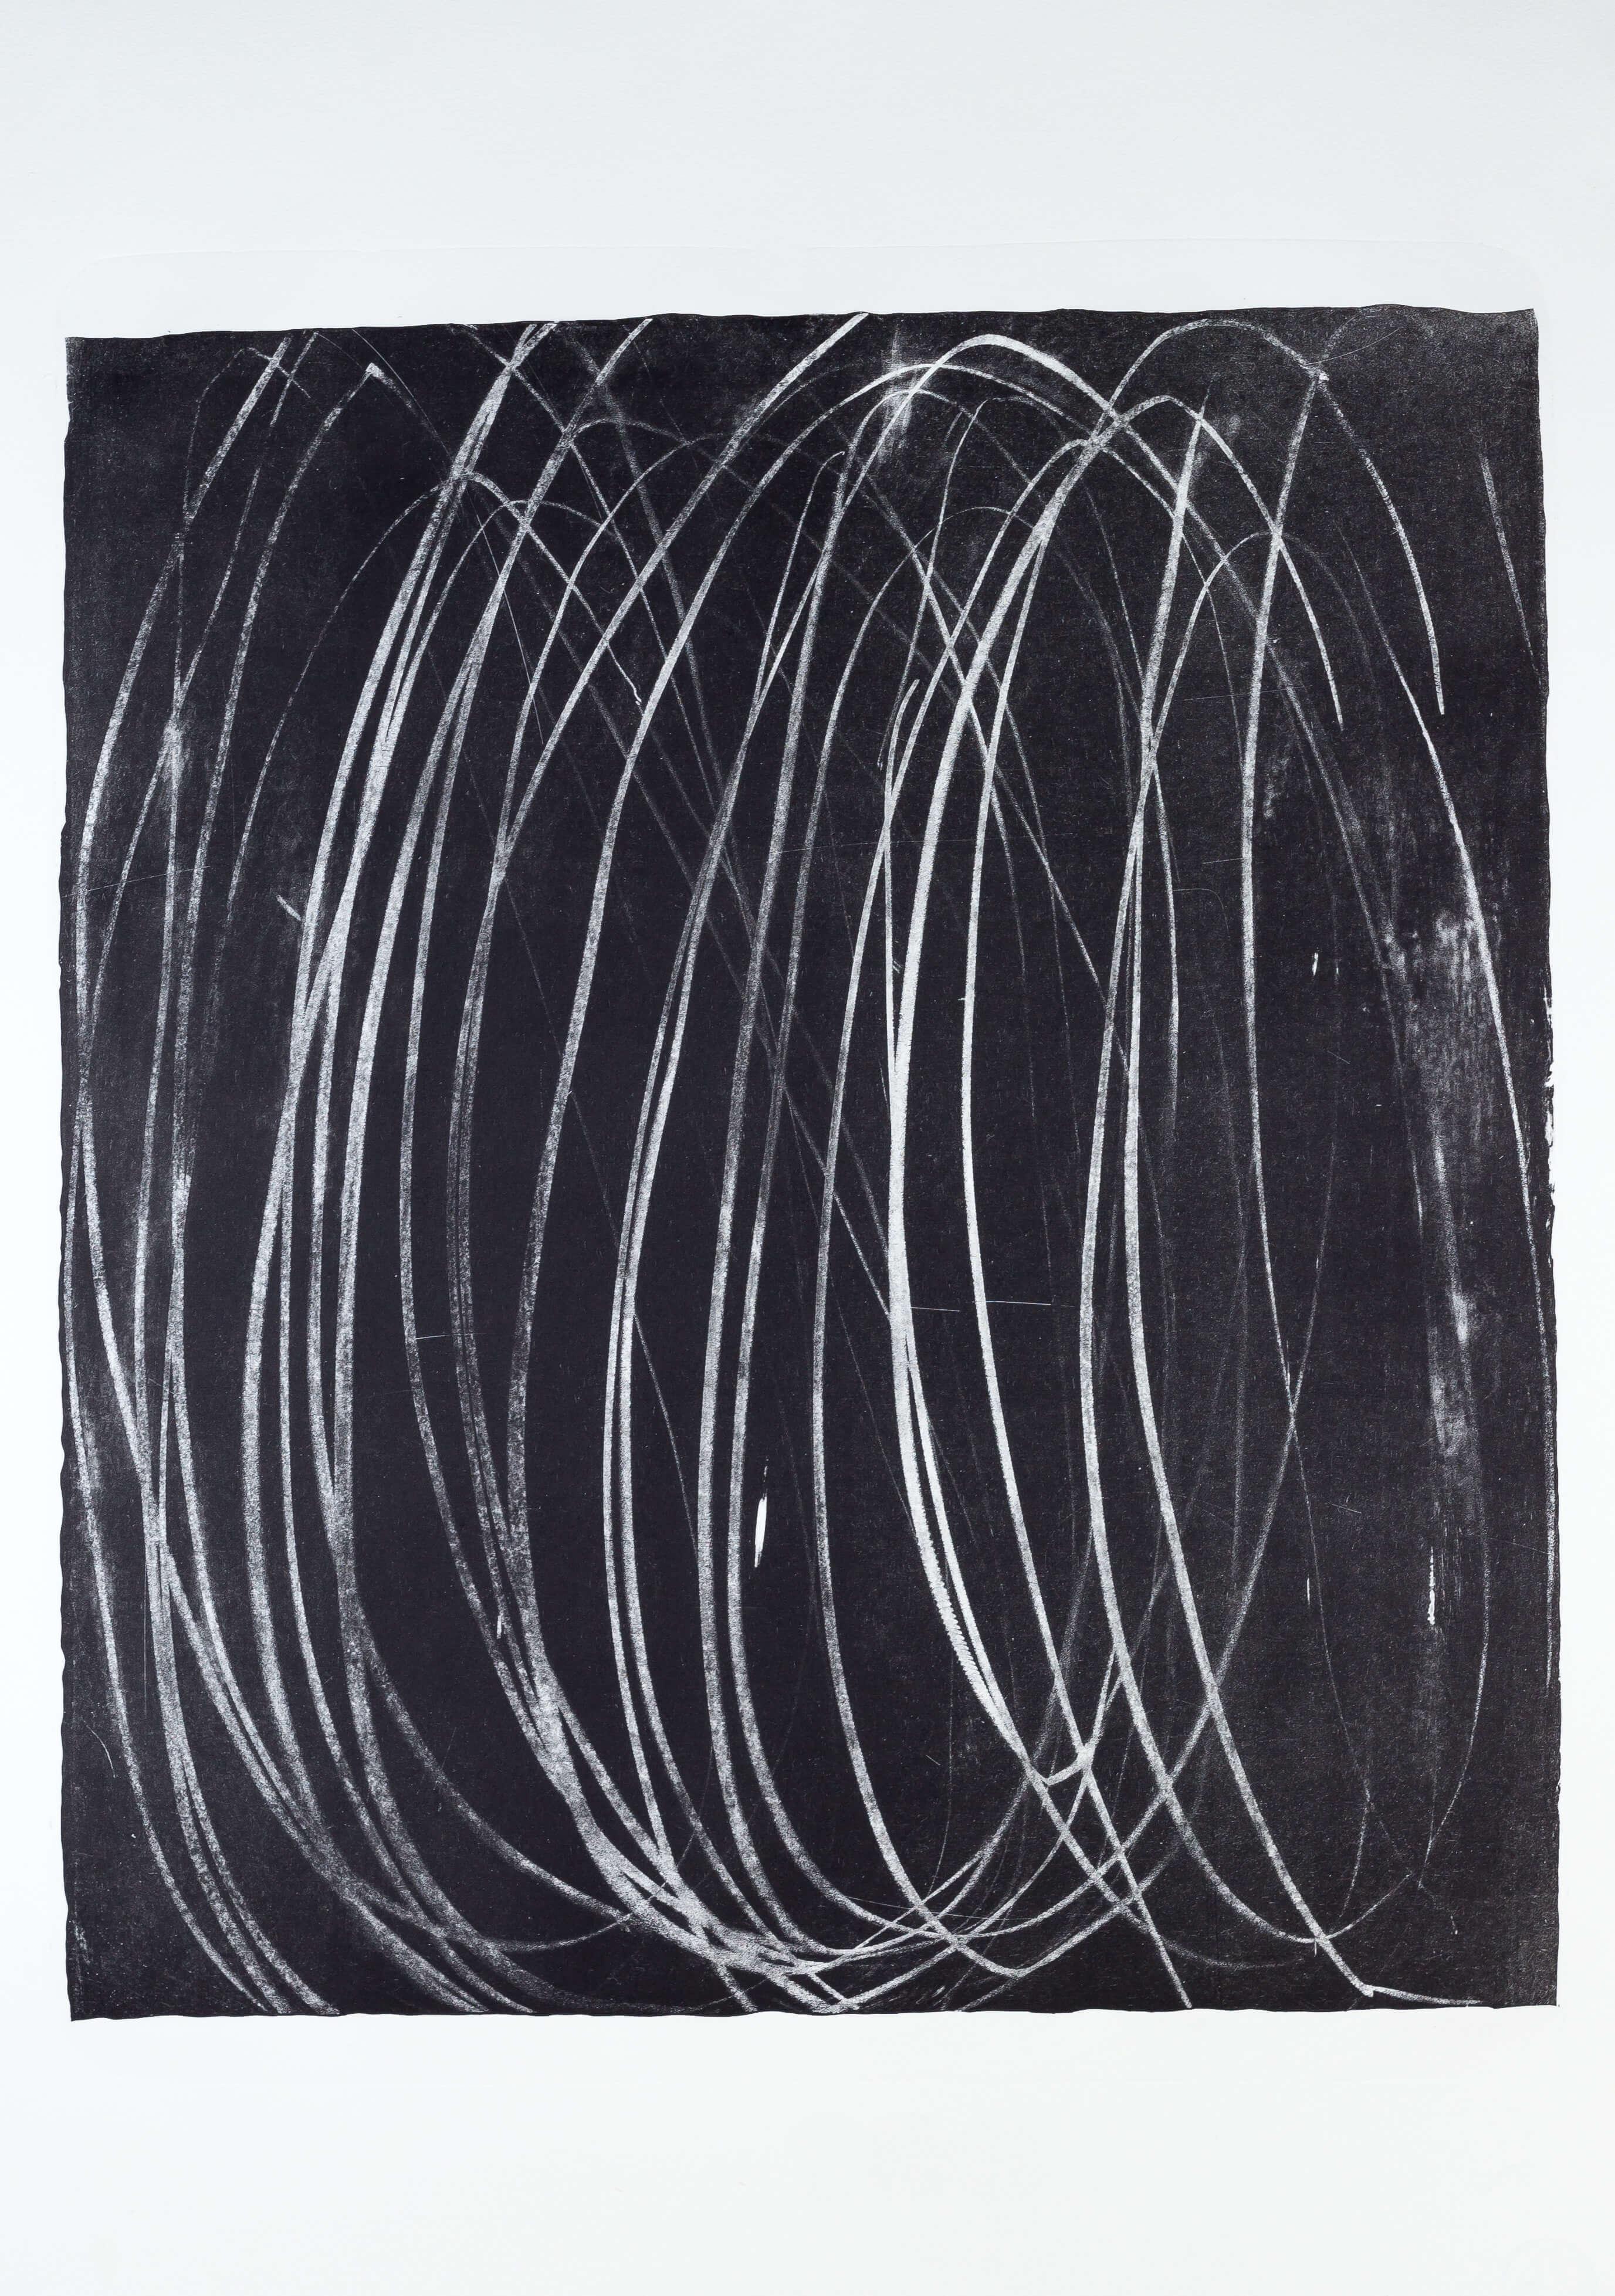 Katharina Albers, Transformation XI, 2011, Lithographie, 4 Auflagen, 59,5x48,5cm